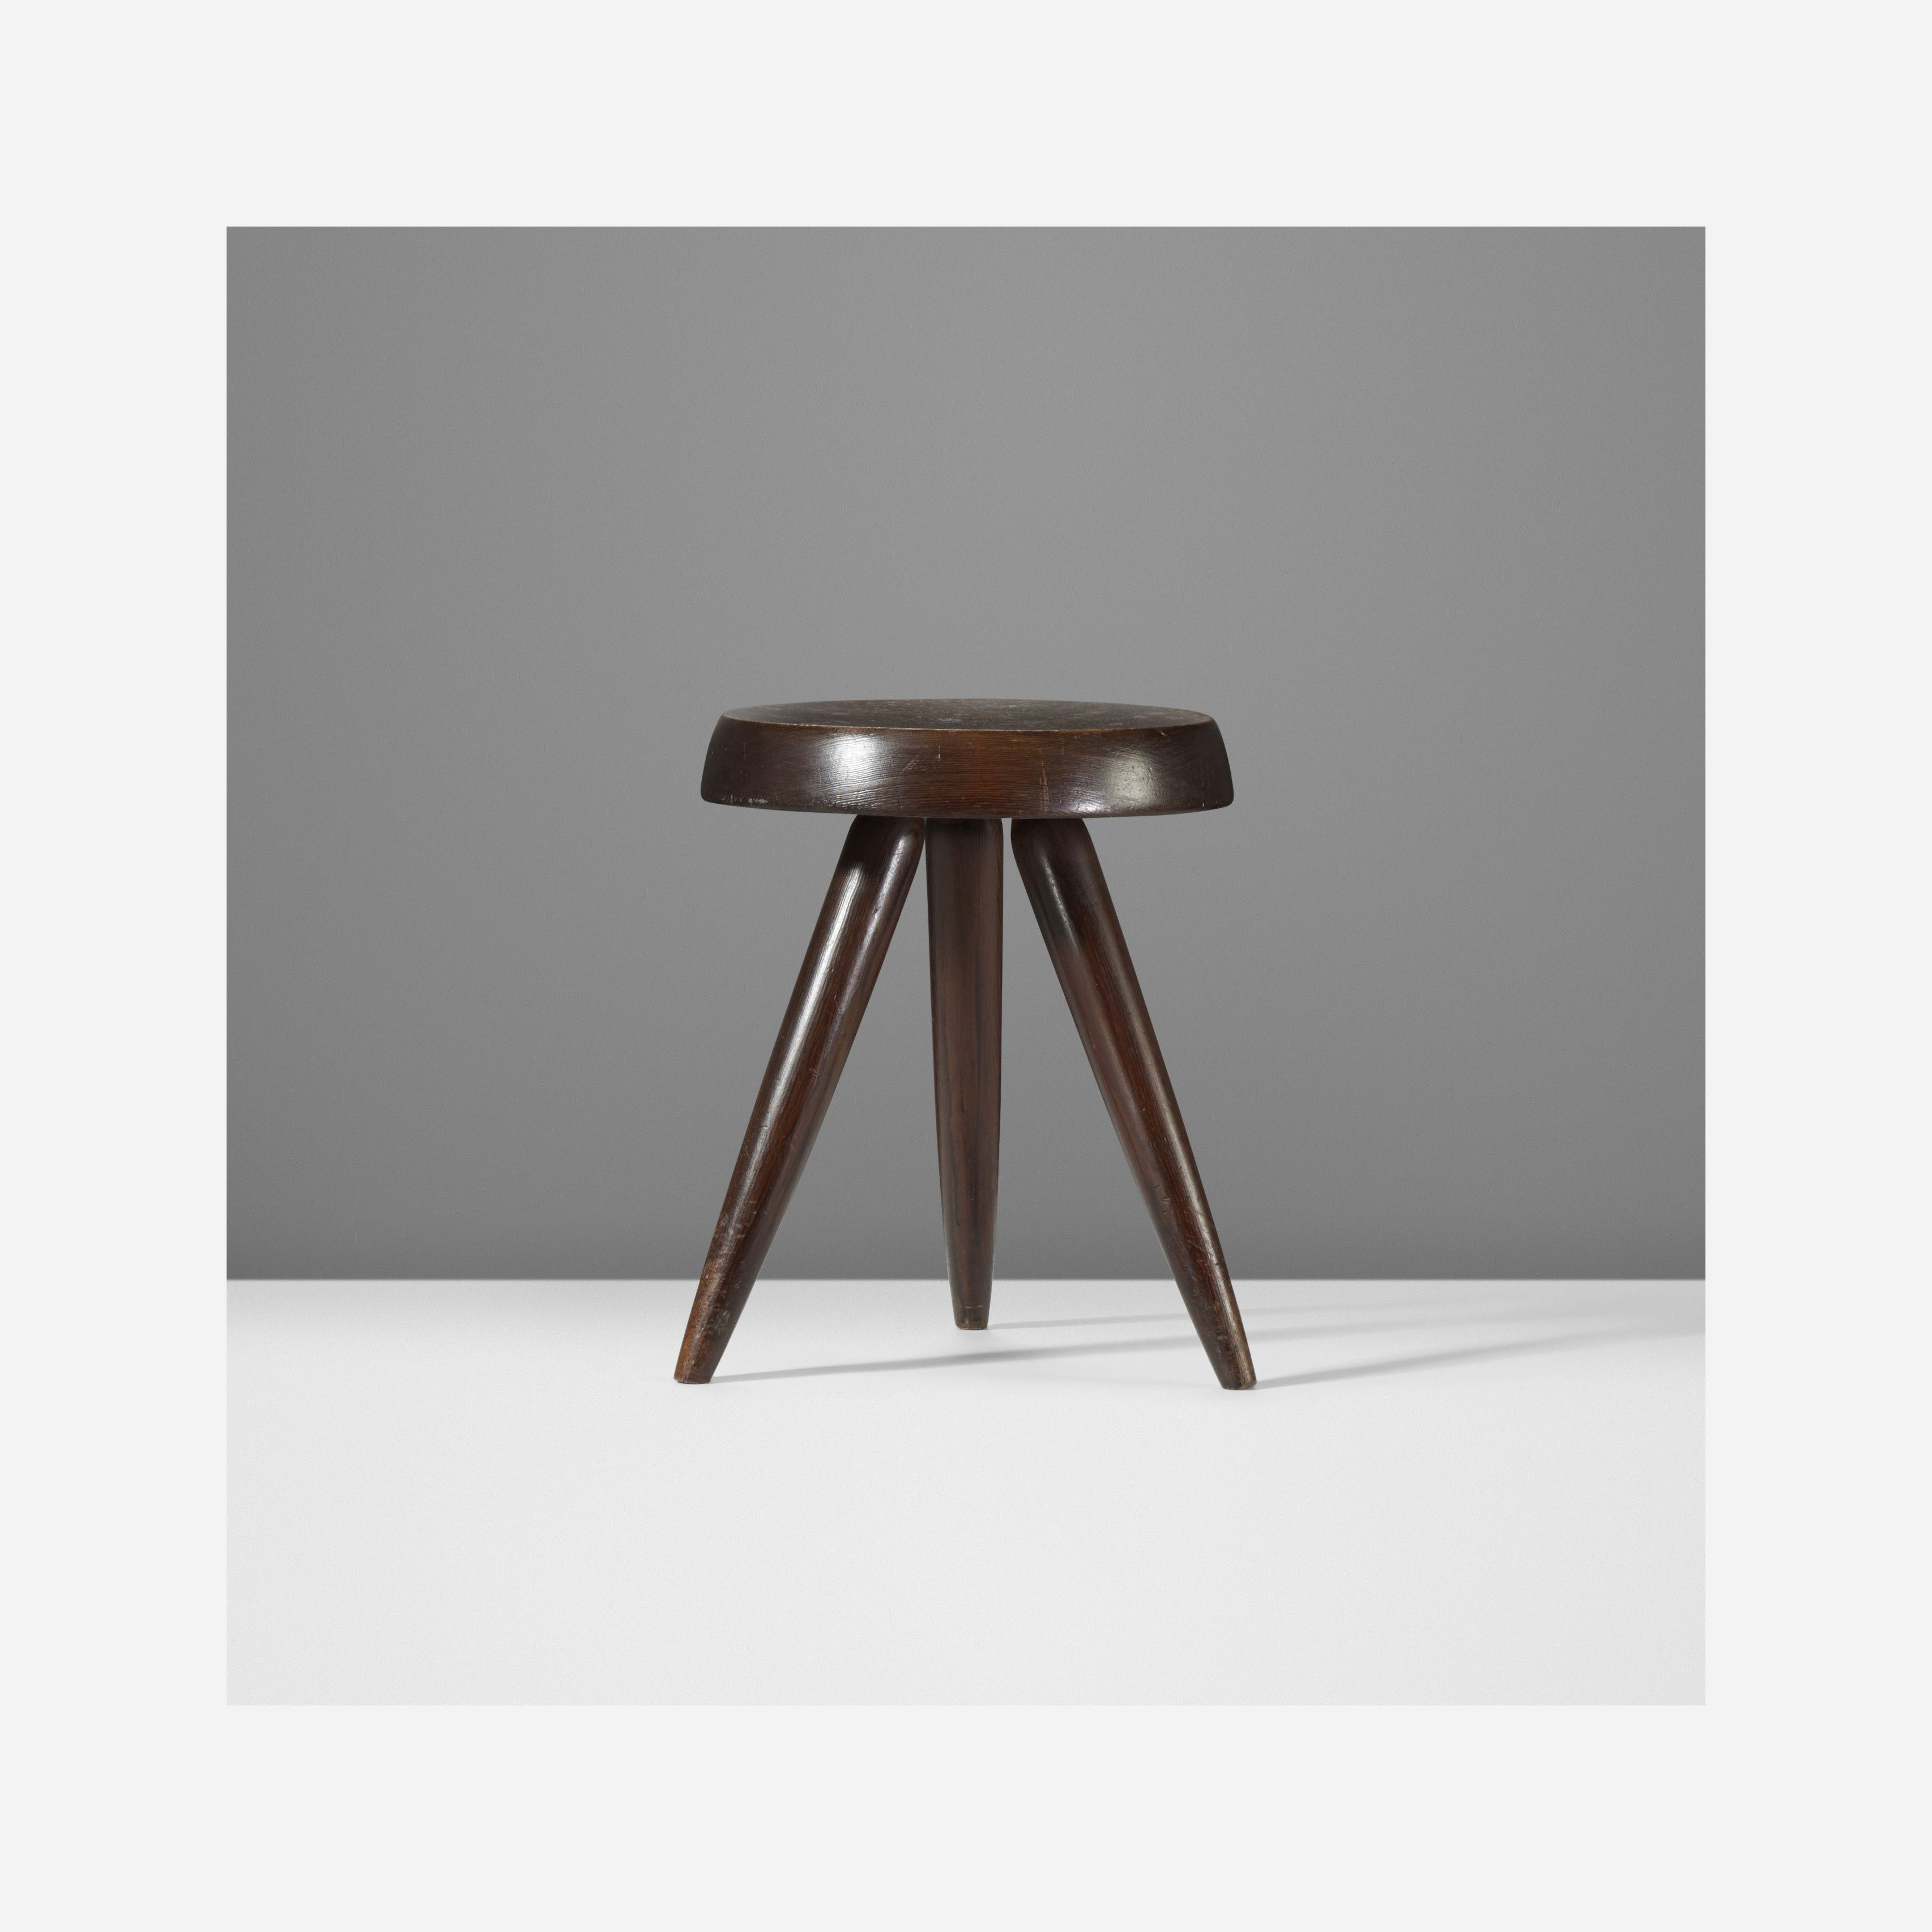 103: Charlotte Perriand / stool < Recherché,